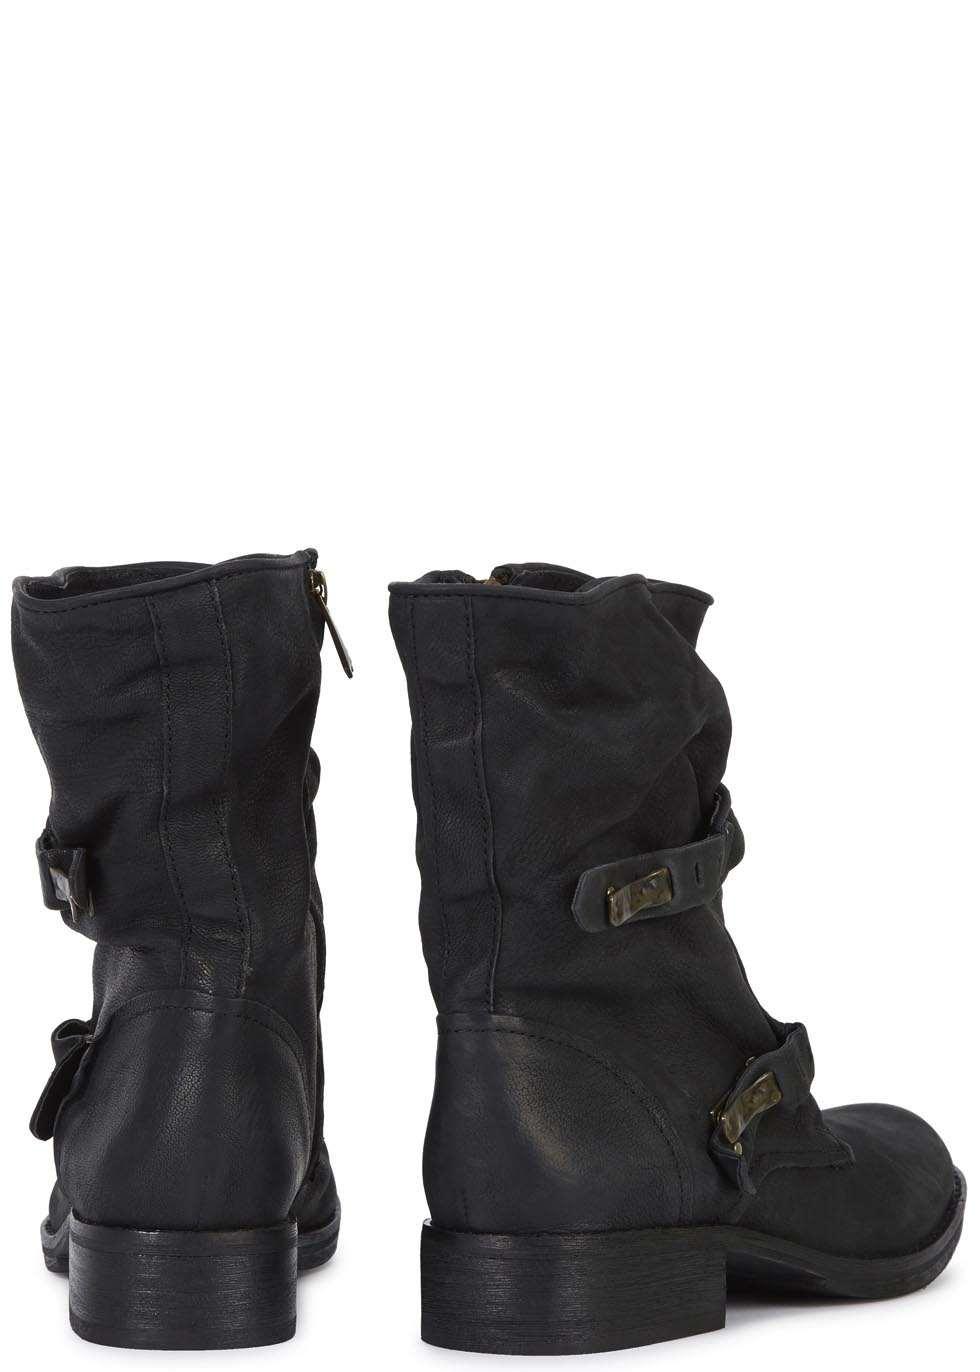 abf53feeb Sam Edelman Ridge Black Leather Boots in Black - Lyst